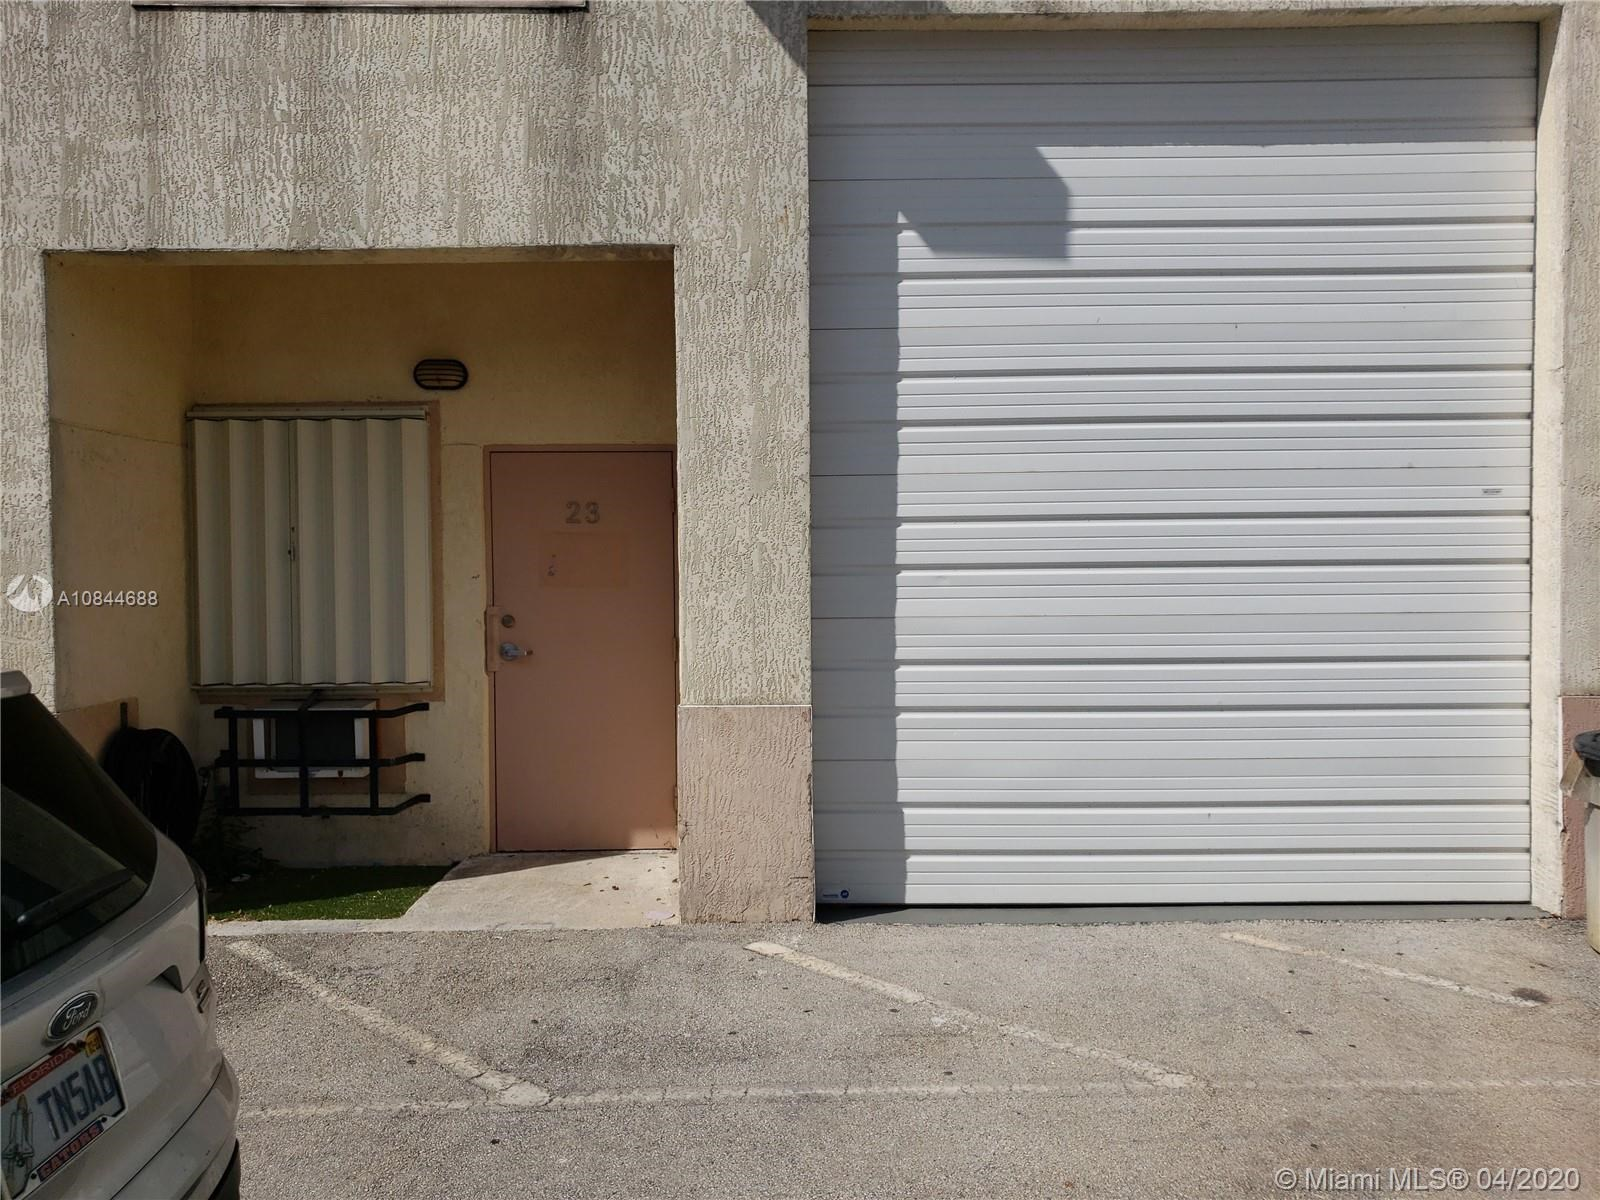 13806 SW 142nd Ave, Miami, FL 33186